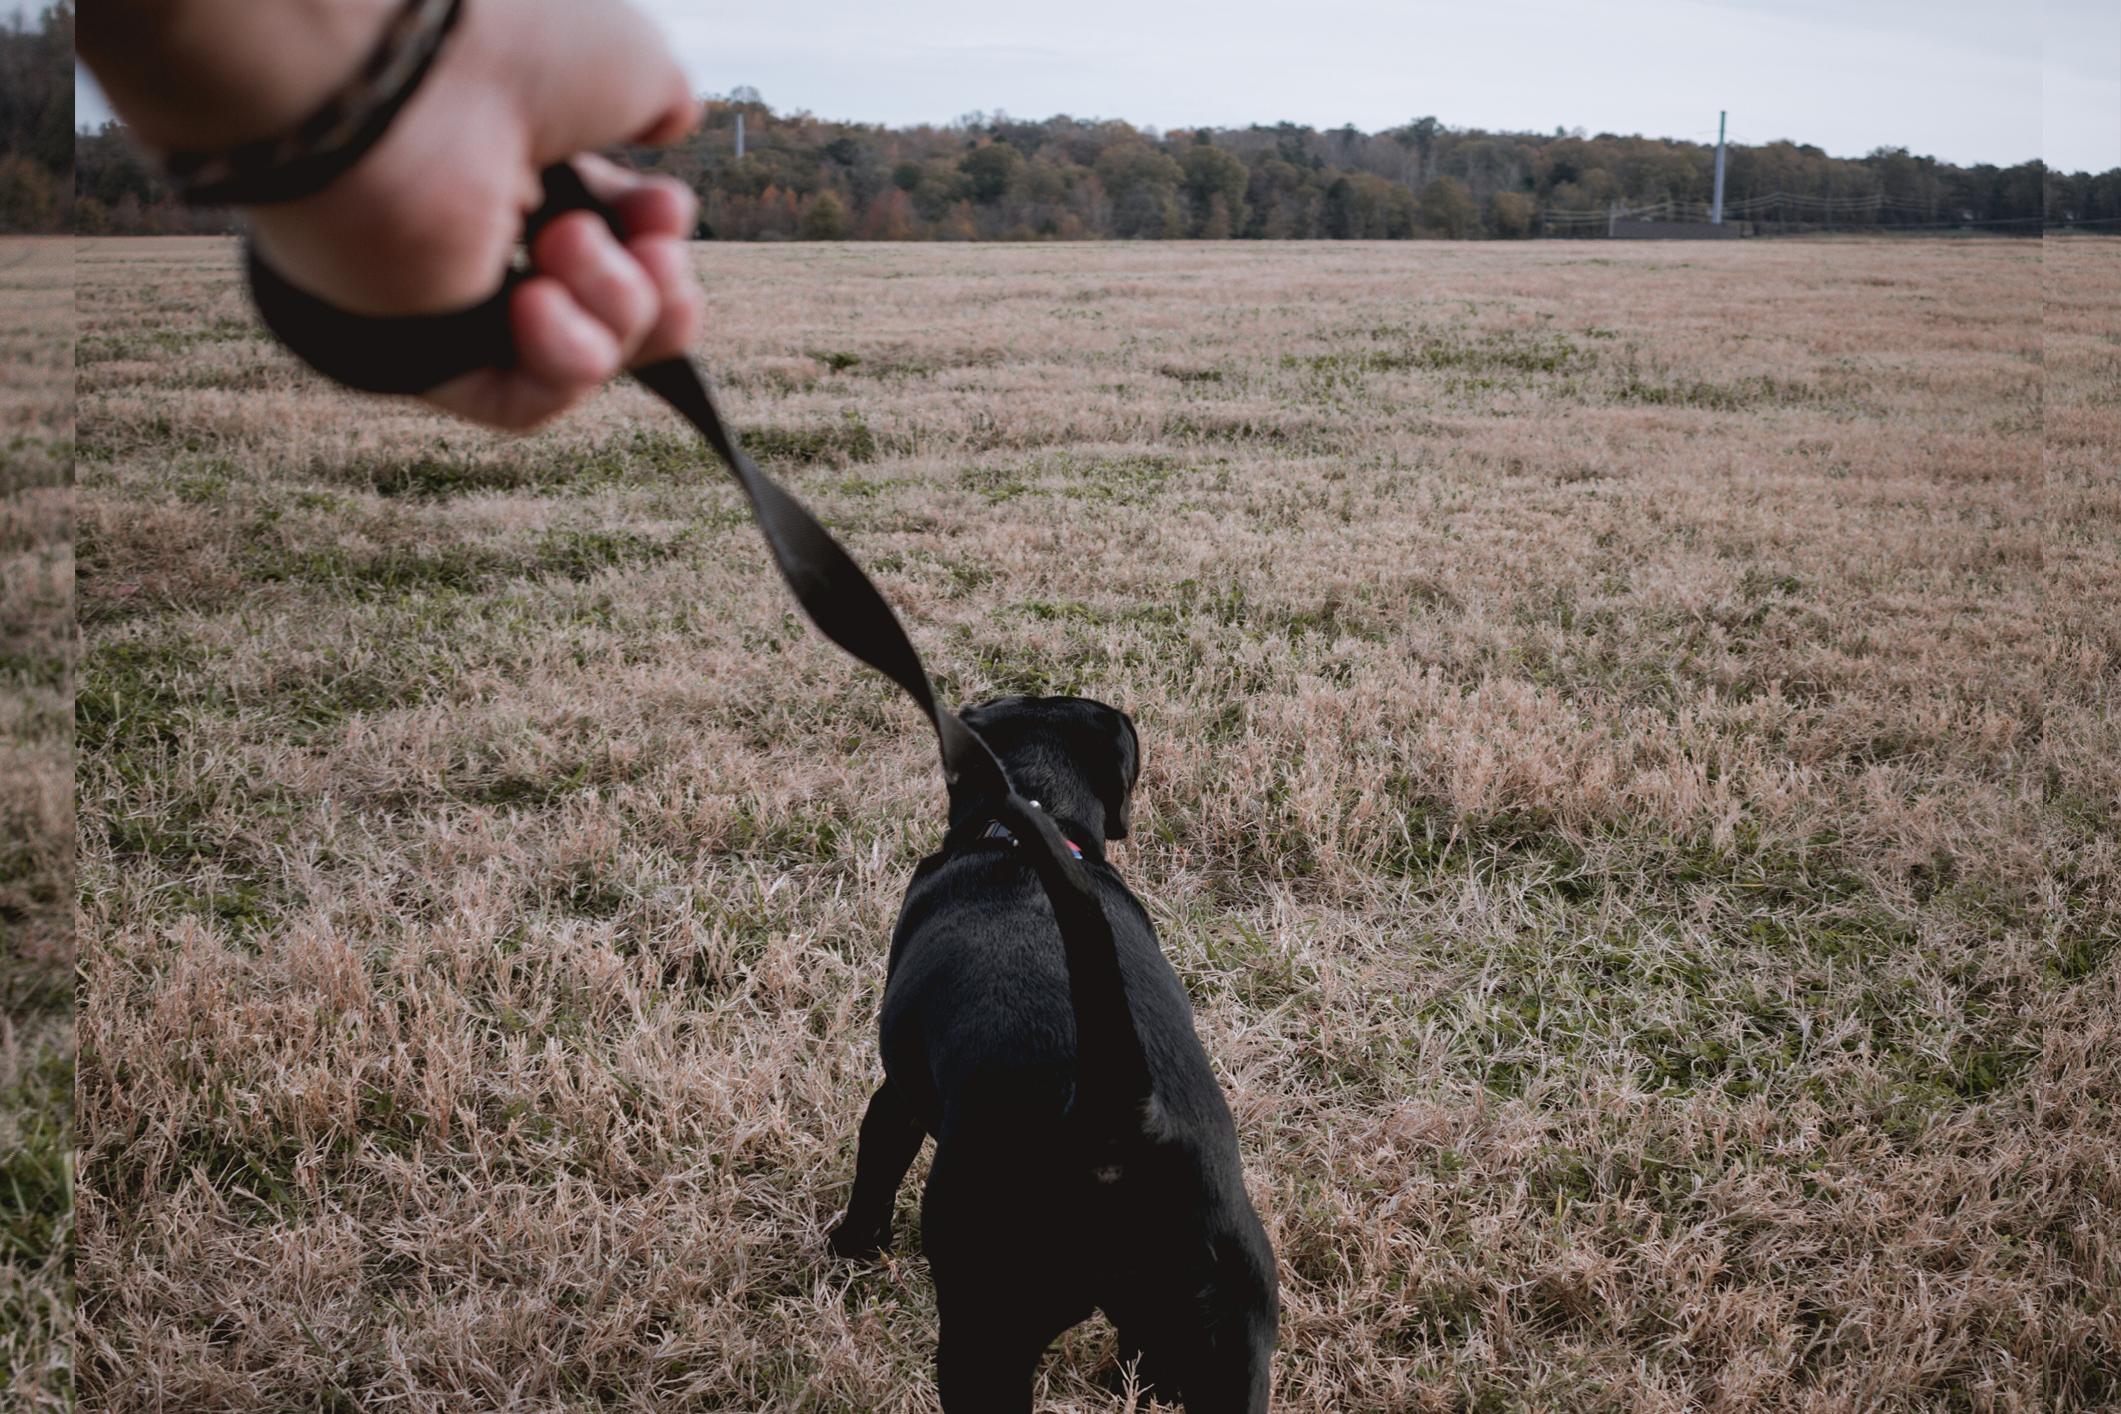 The Dog Owner's Risk Appetite